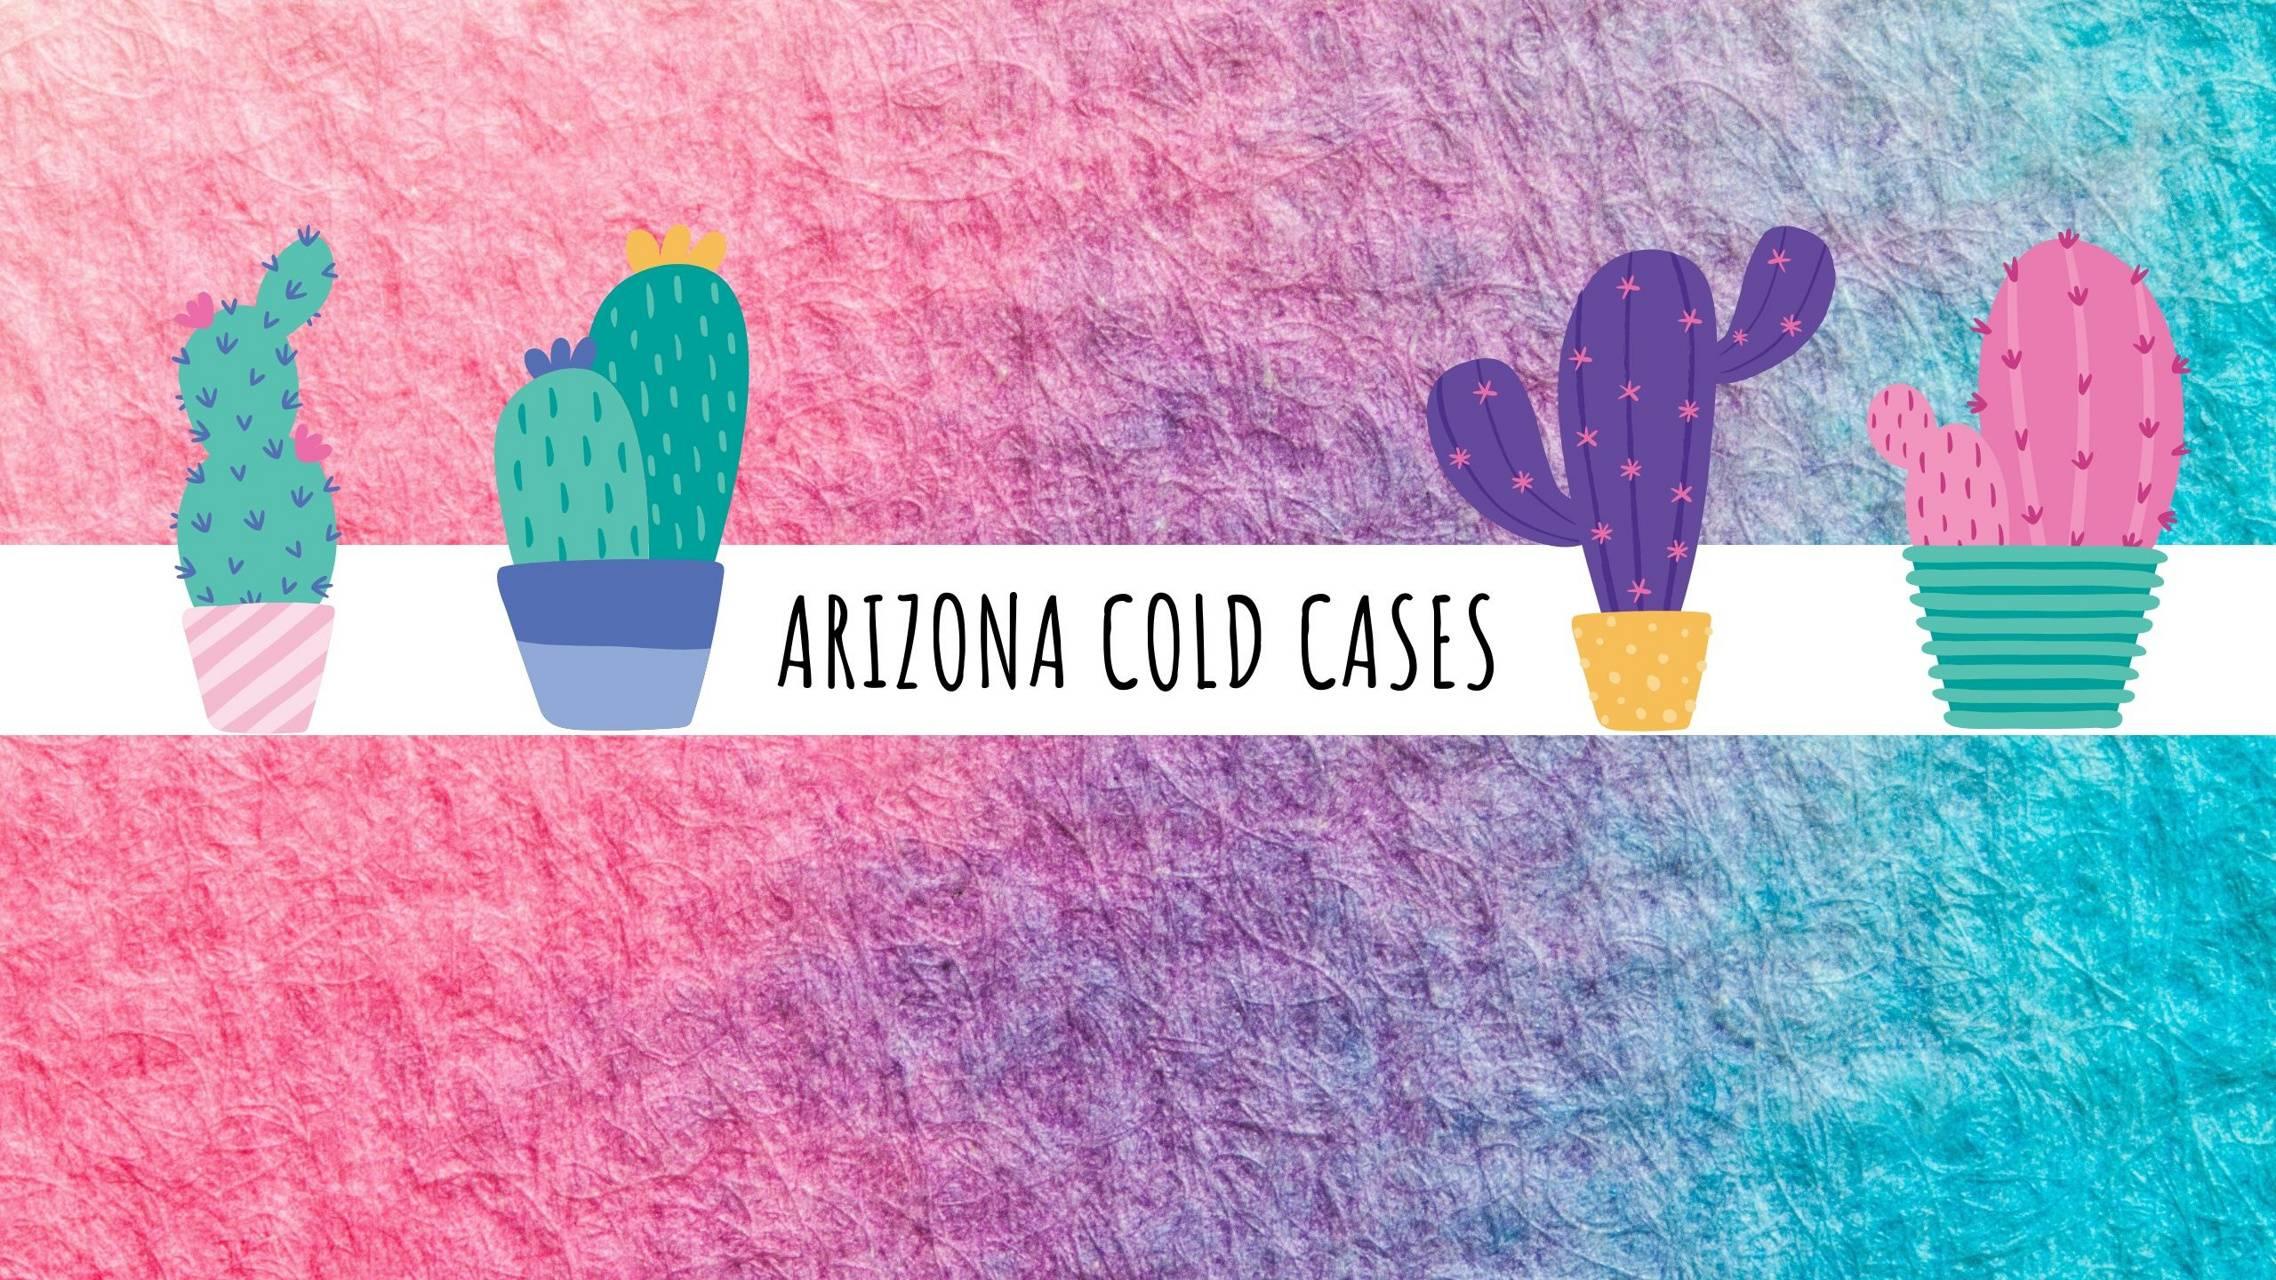 Arizona Cold Cases